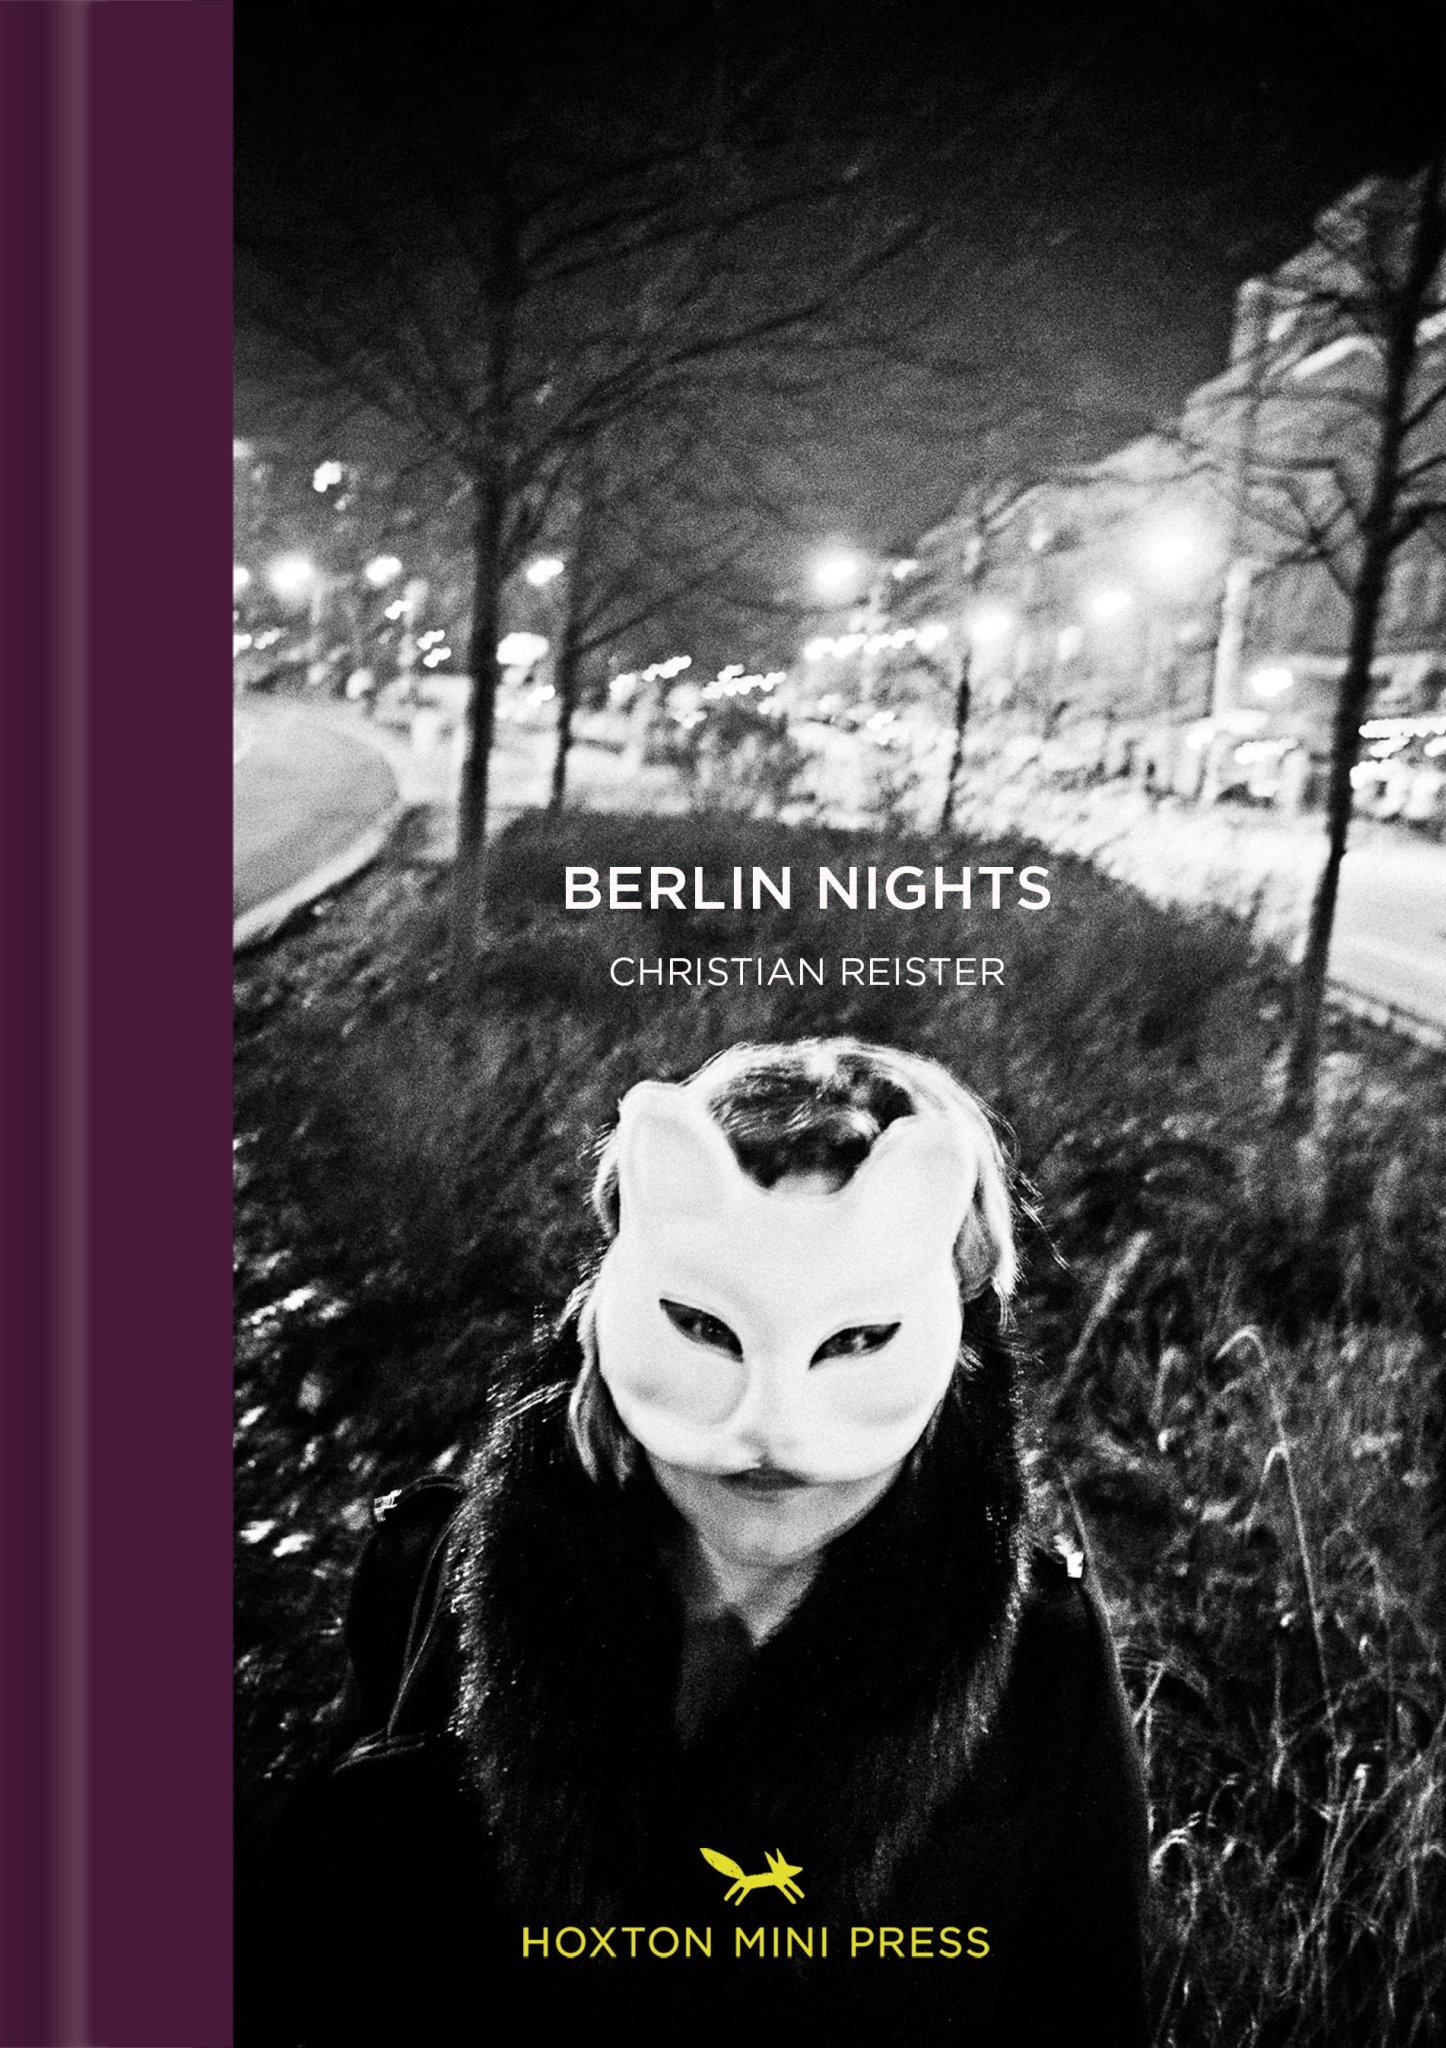 Christian Reister: Berlin's Frenetic Nightlife in Gritty Black and White